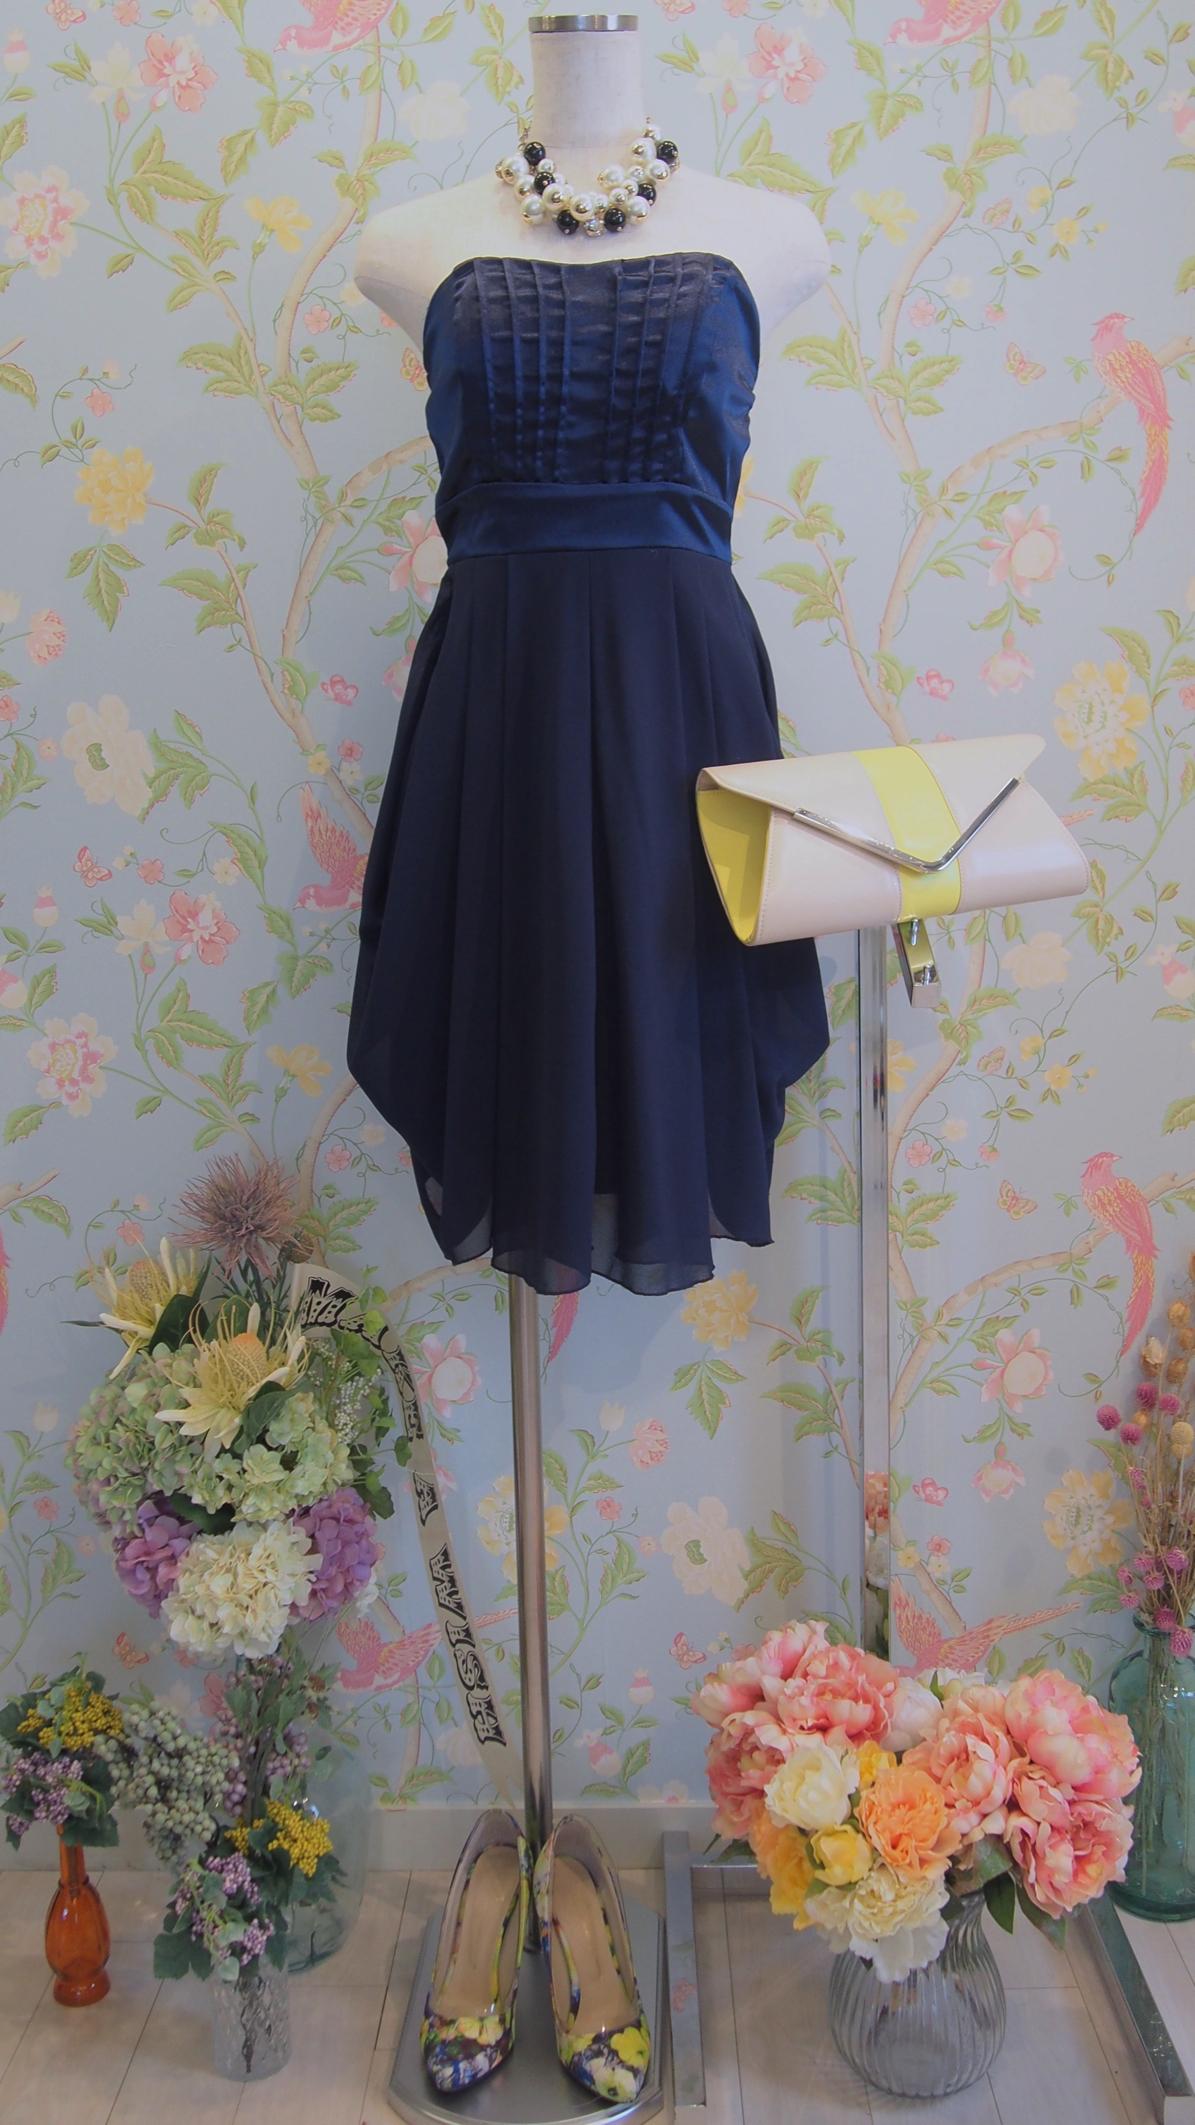 nr_dress_458